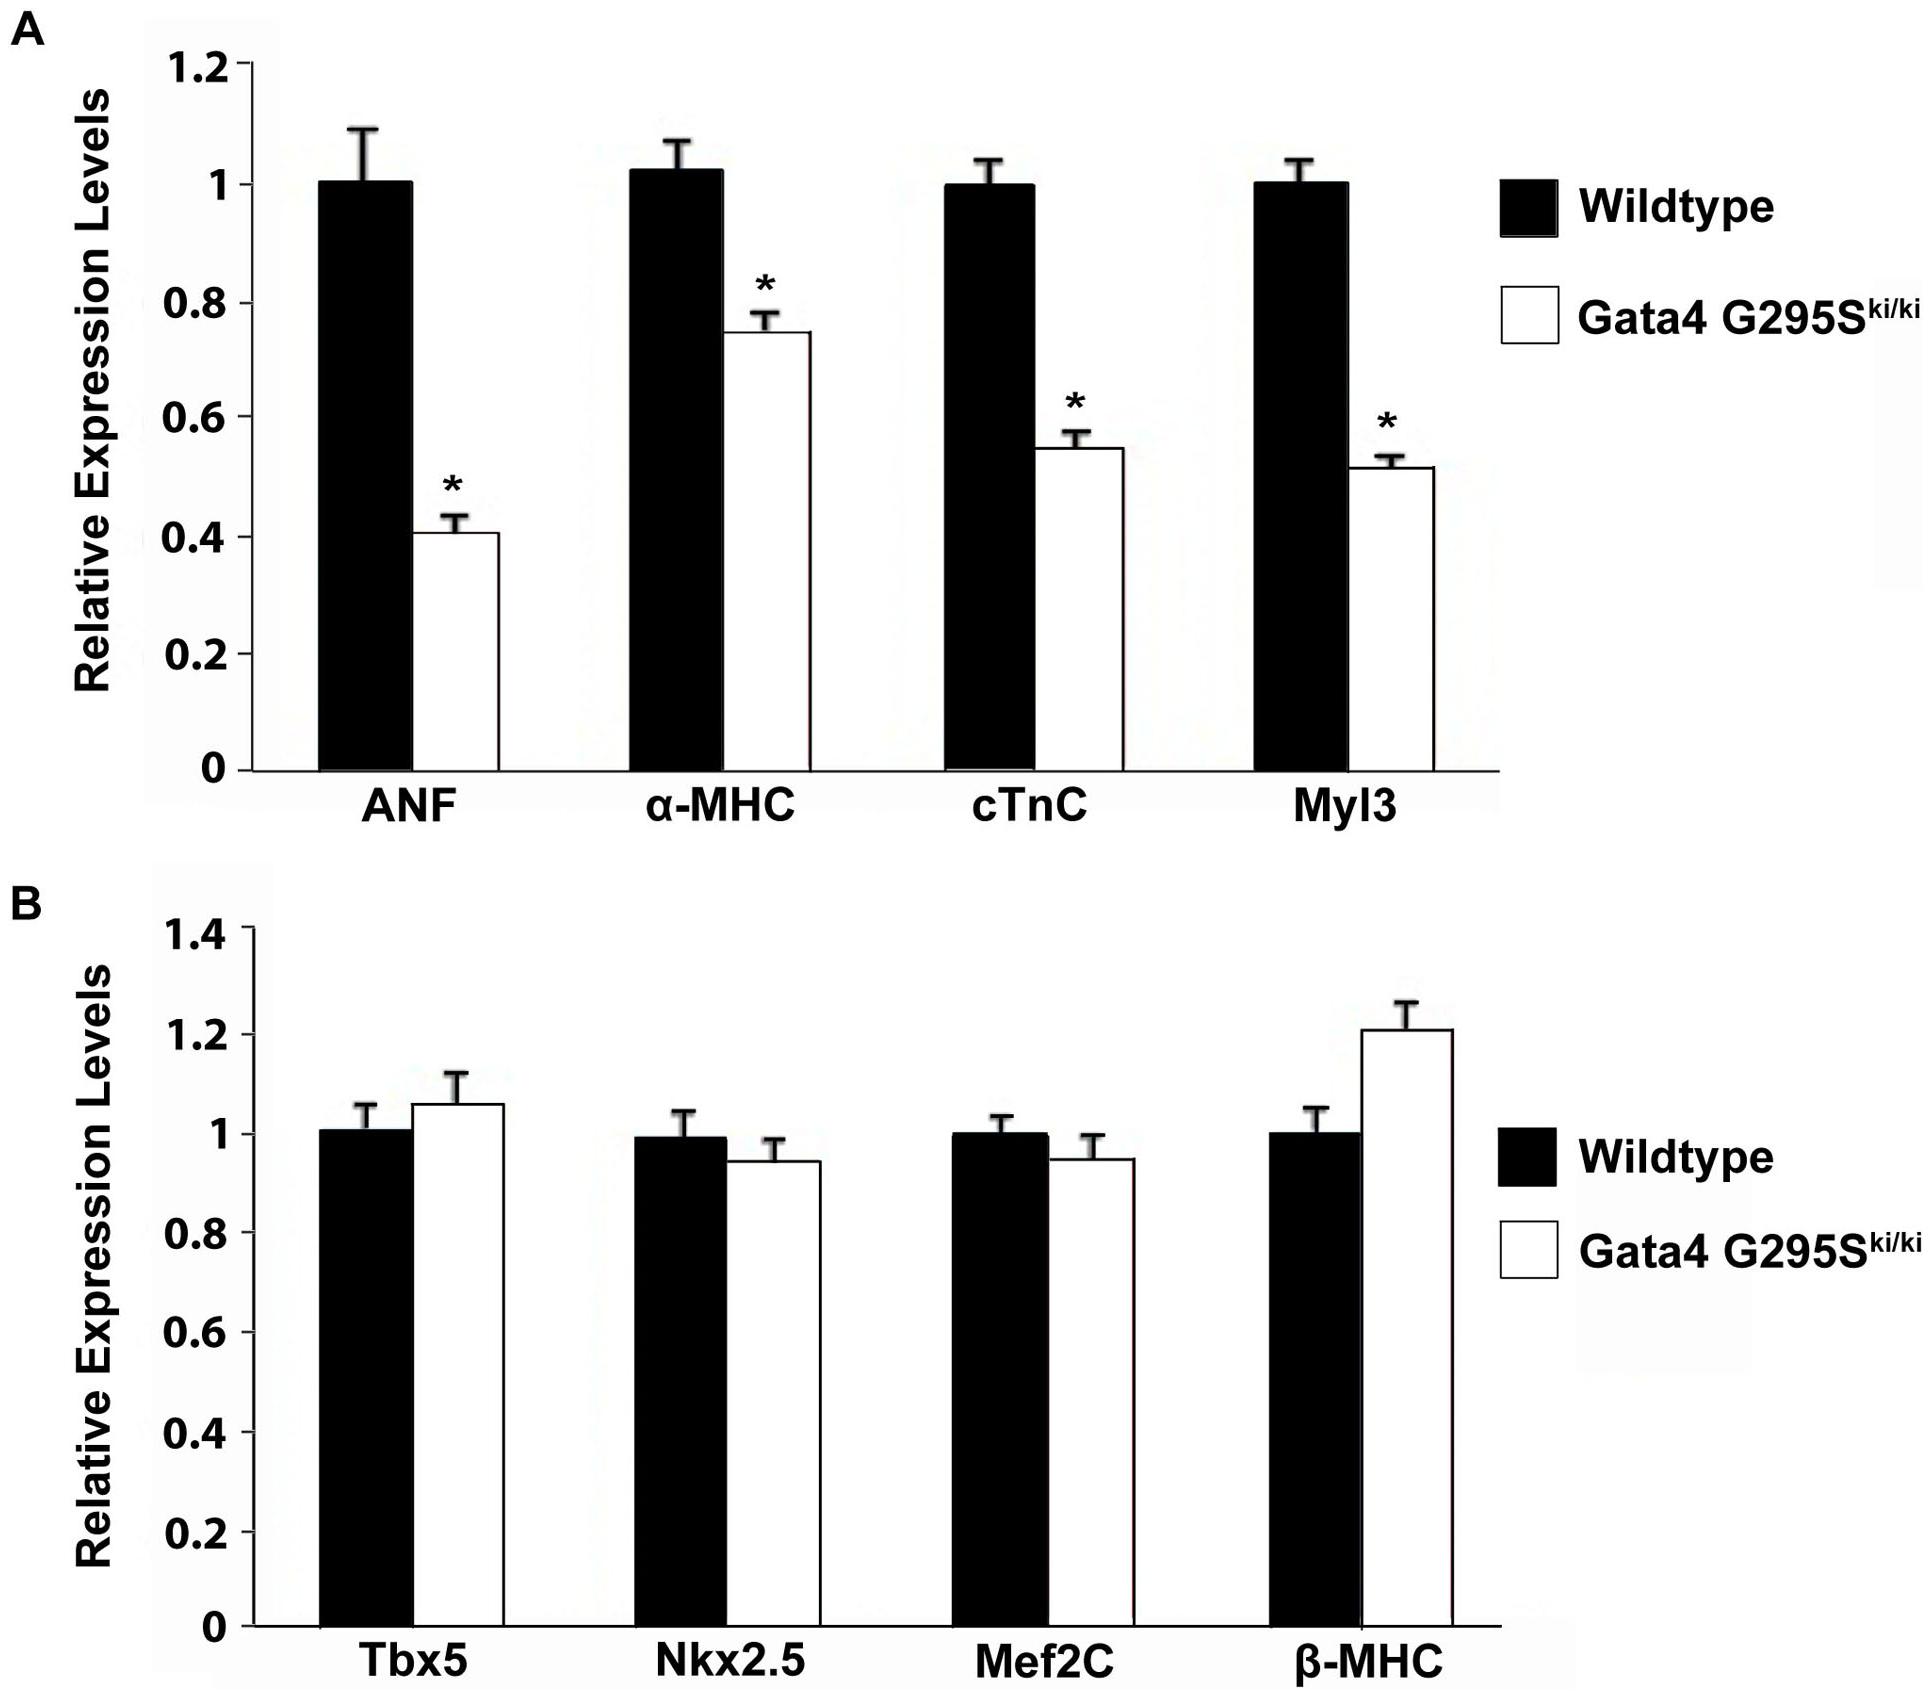 Decreased expression of Gata4 target genes in <i>Gata4 G295S<sup>ki/ki</sup></i> embryonic hearts.